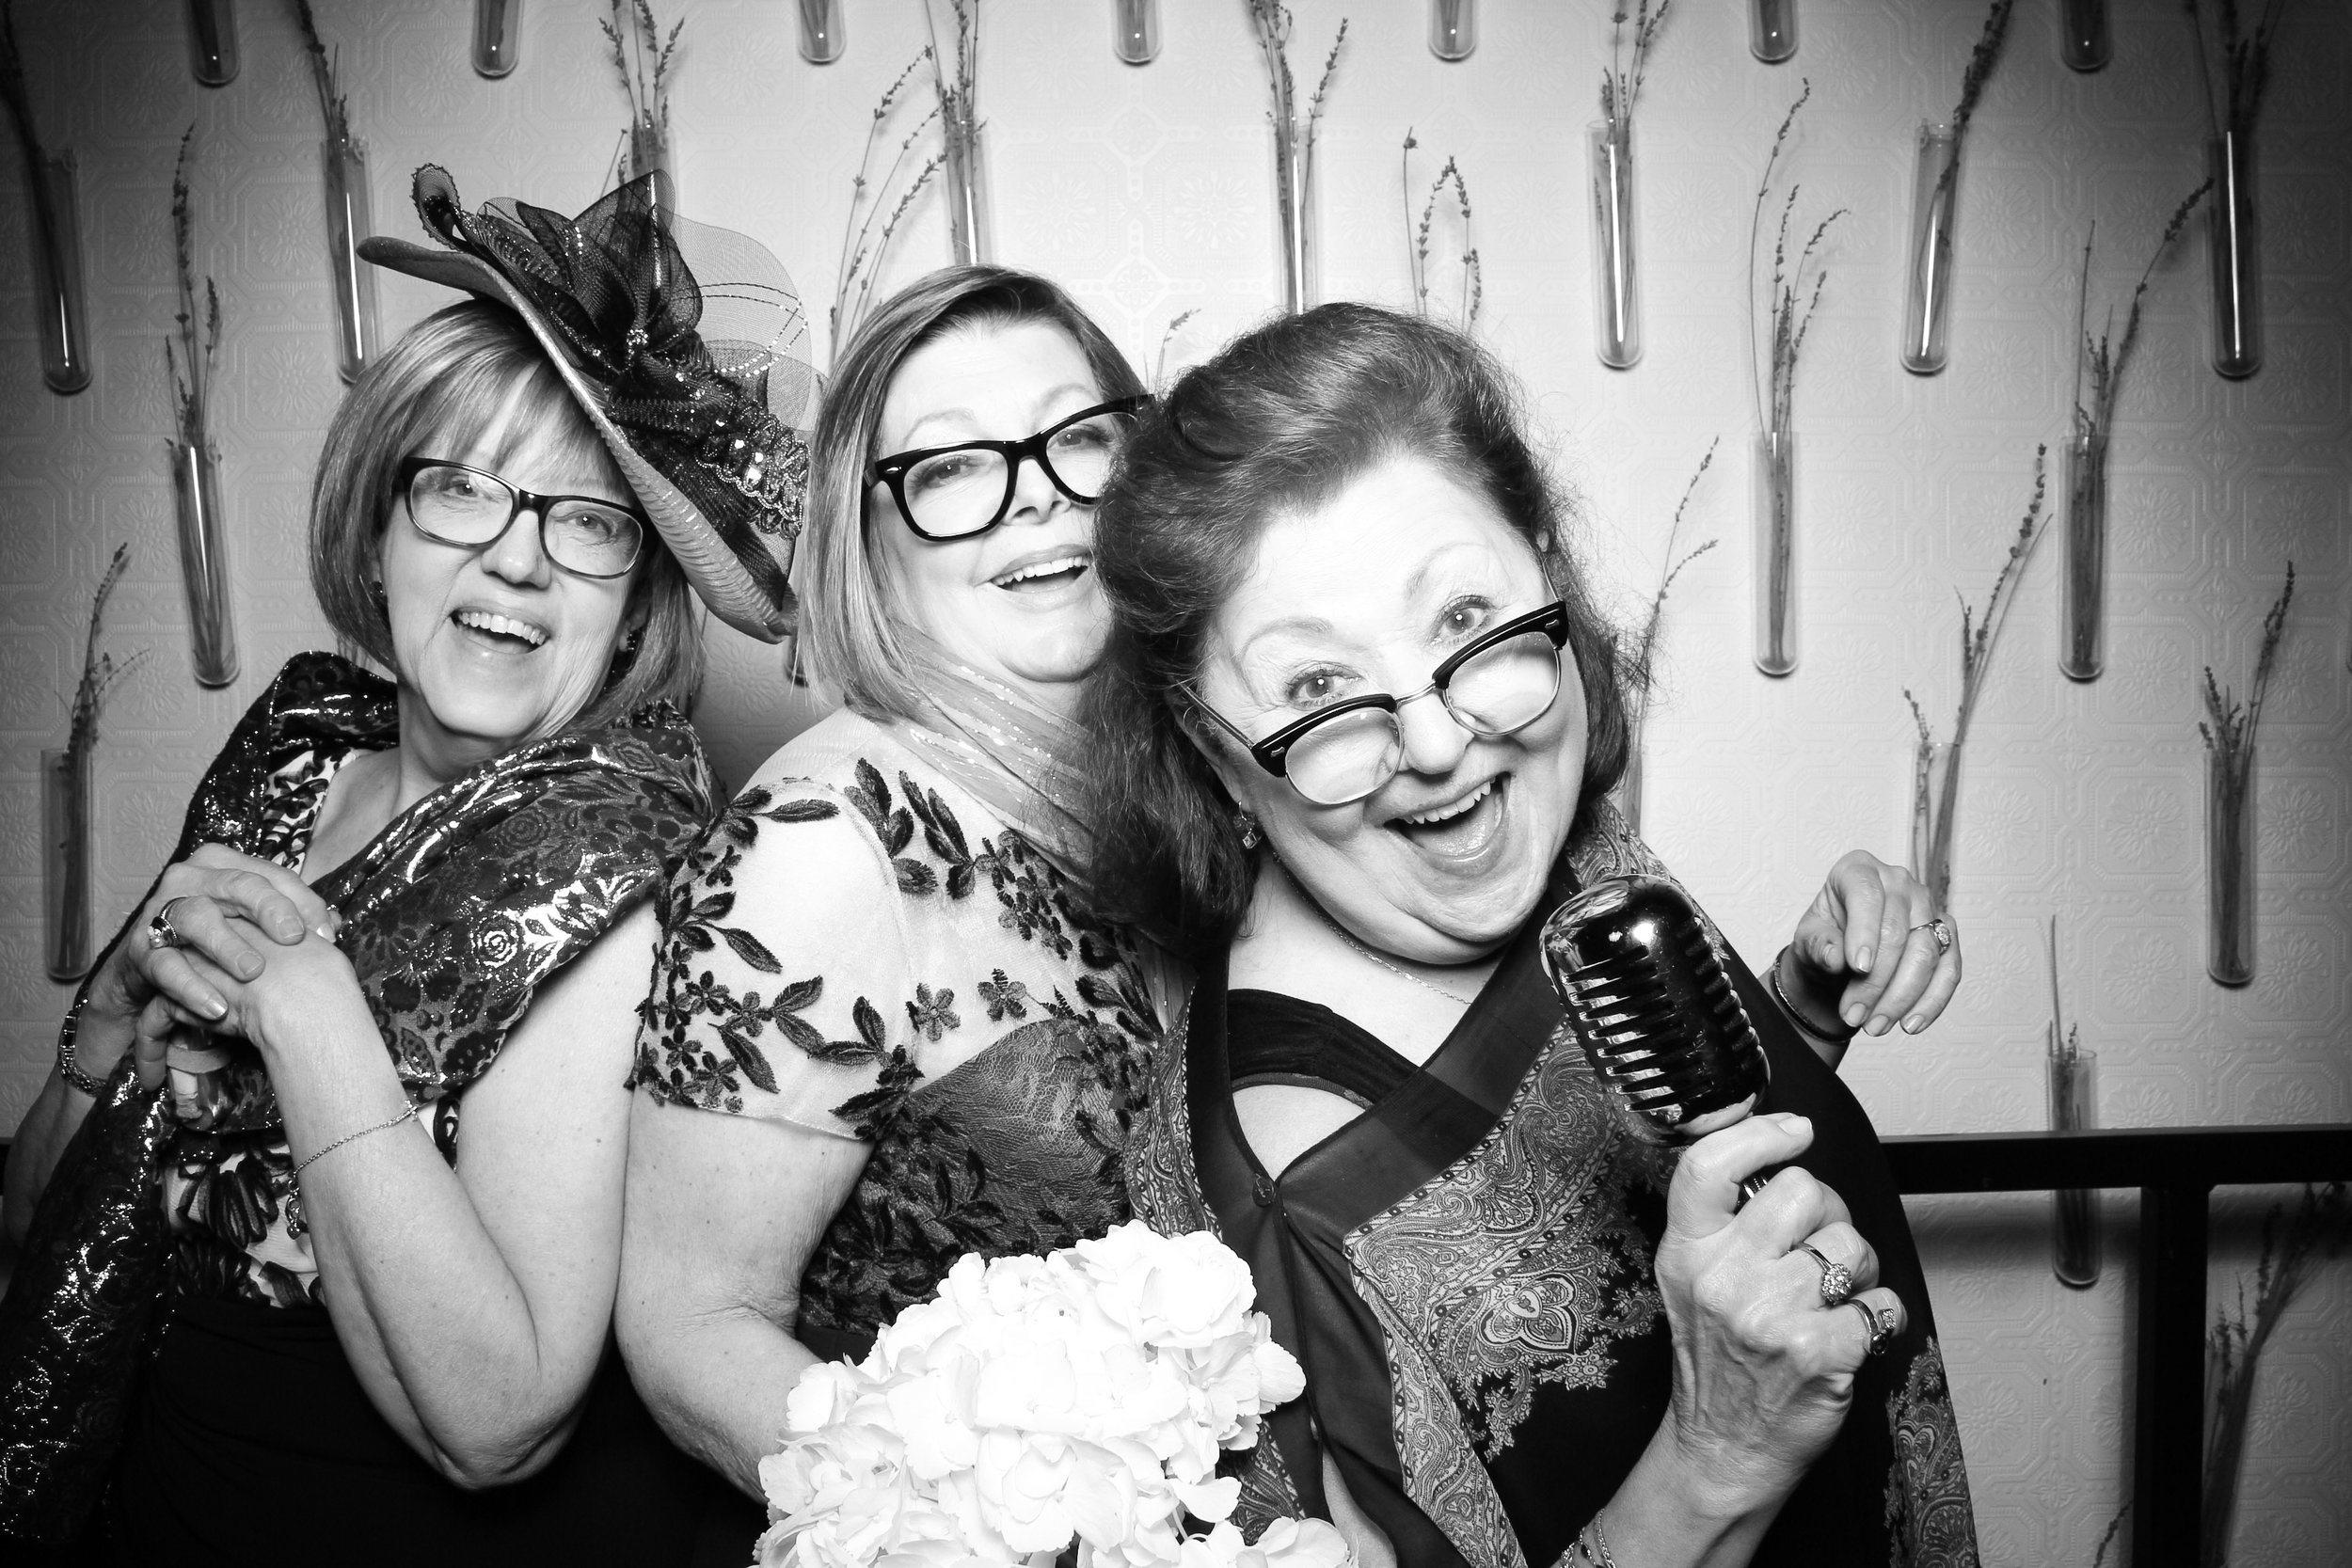 Chicago_Vintage_Wedding_Photobooth_Nellcote_20.jpg